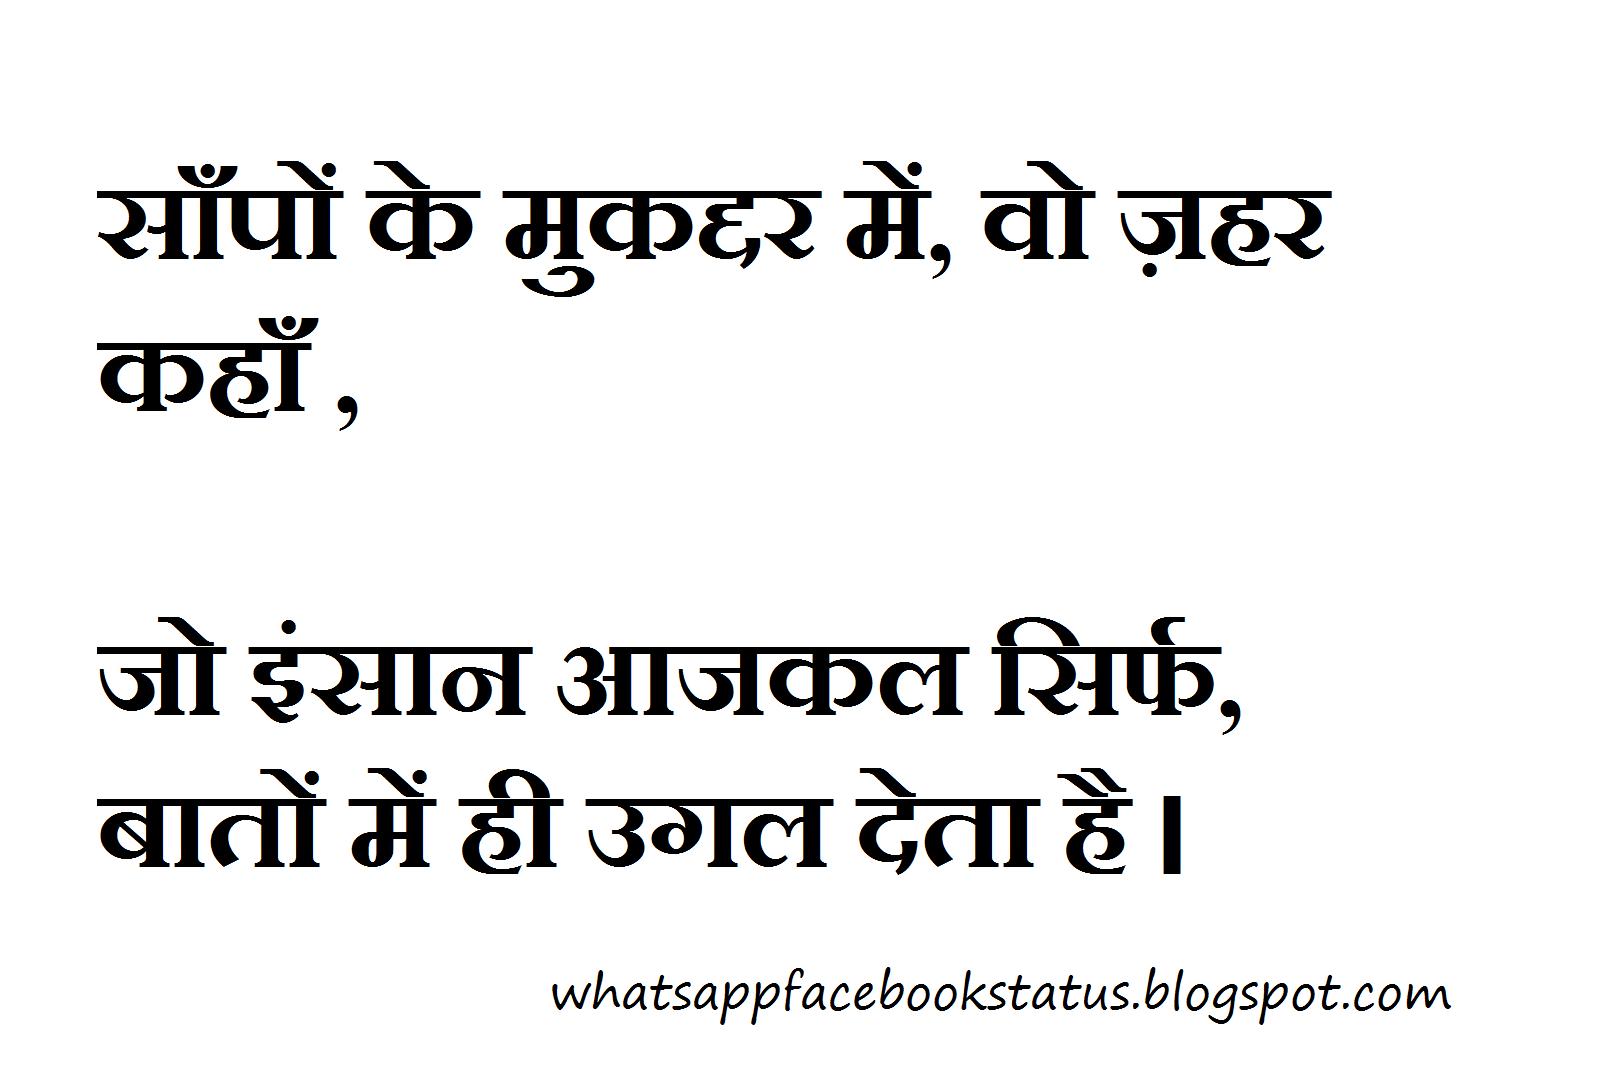 faadu taunt attitude whatsapp status for fake people   whatsapp facebook status quotes